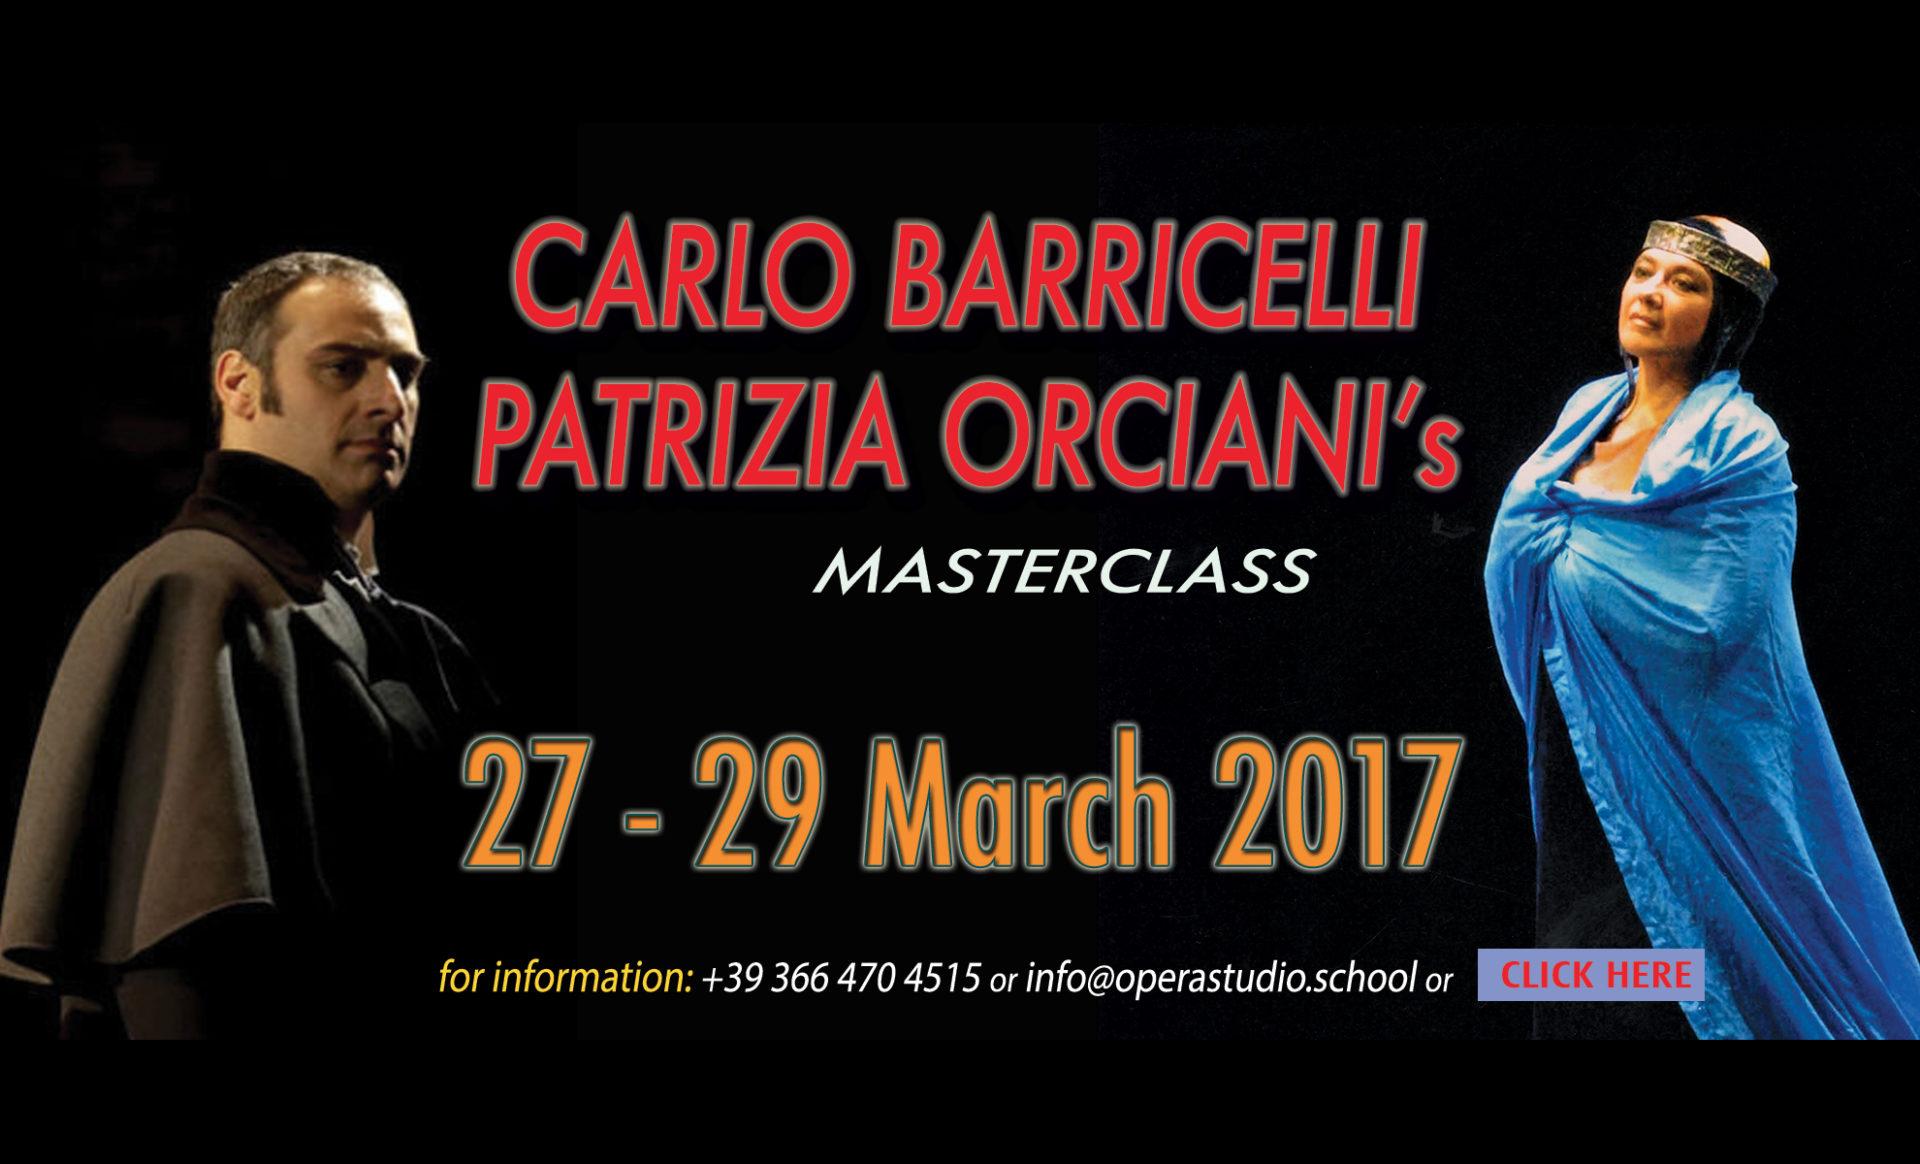 ORCIANI-BARRICELI_march_2017